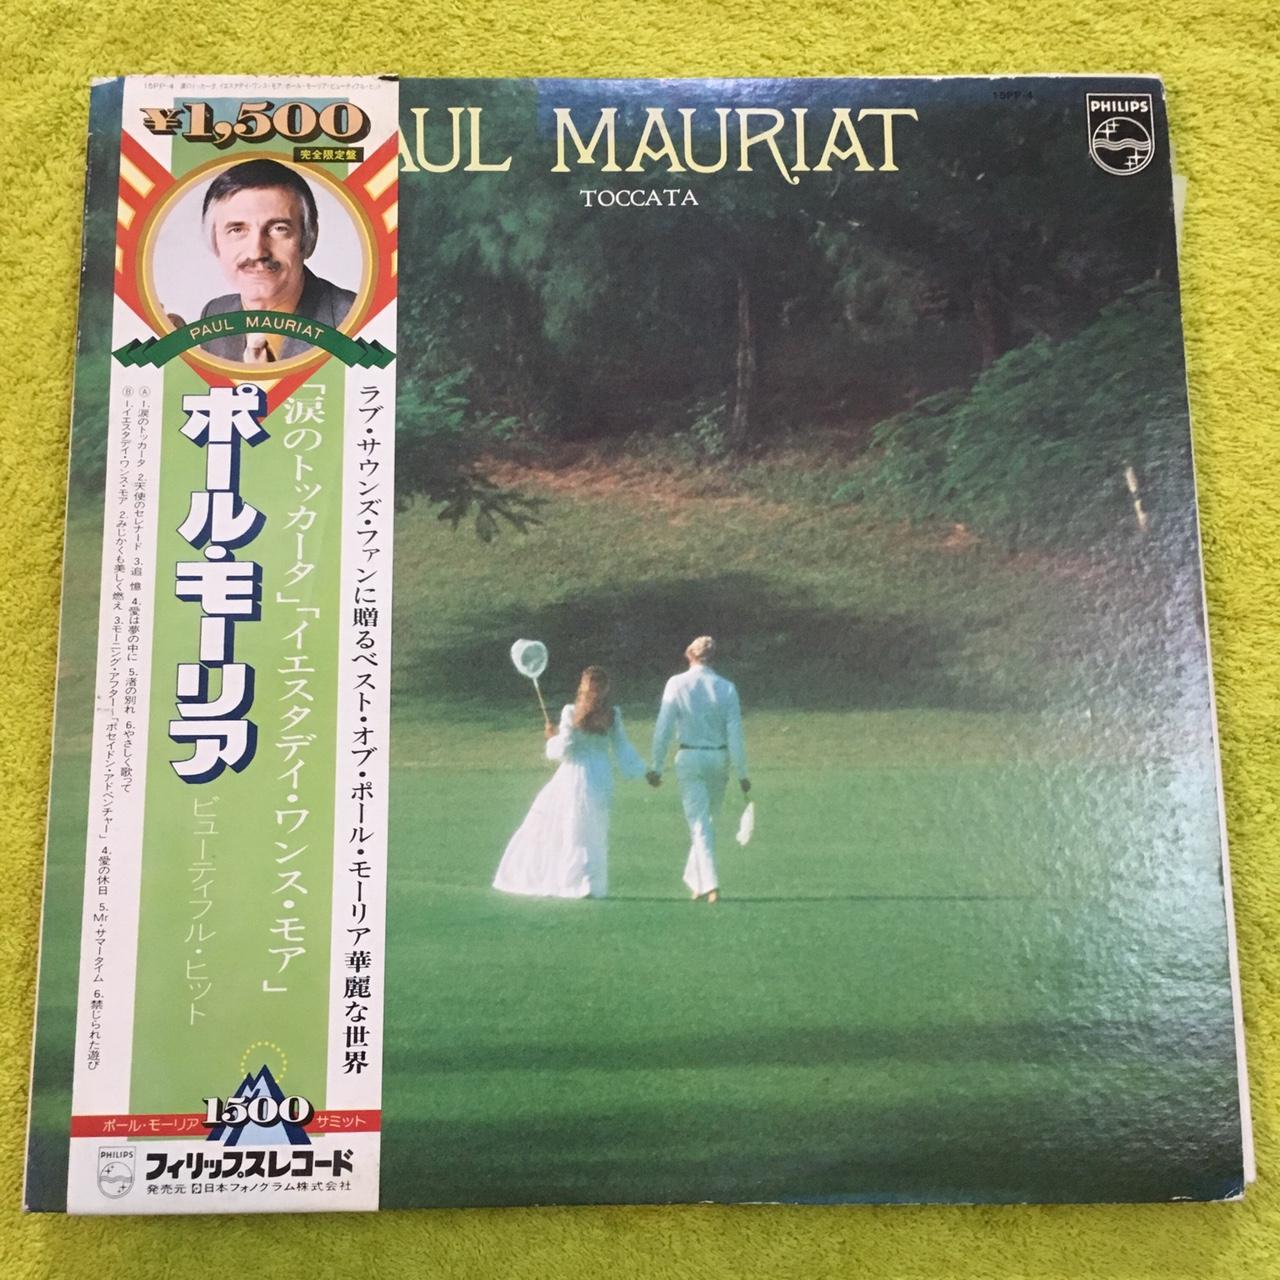 paul-mauriat-toccata